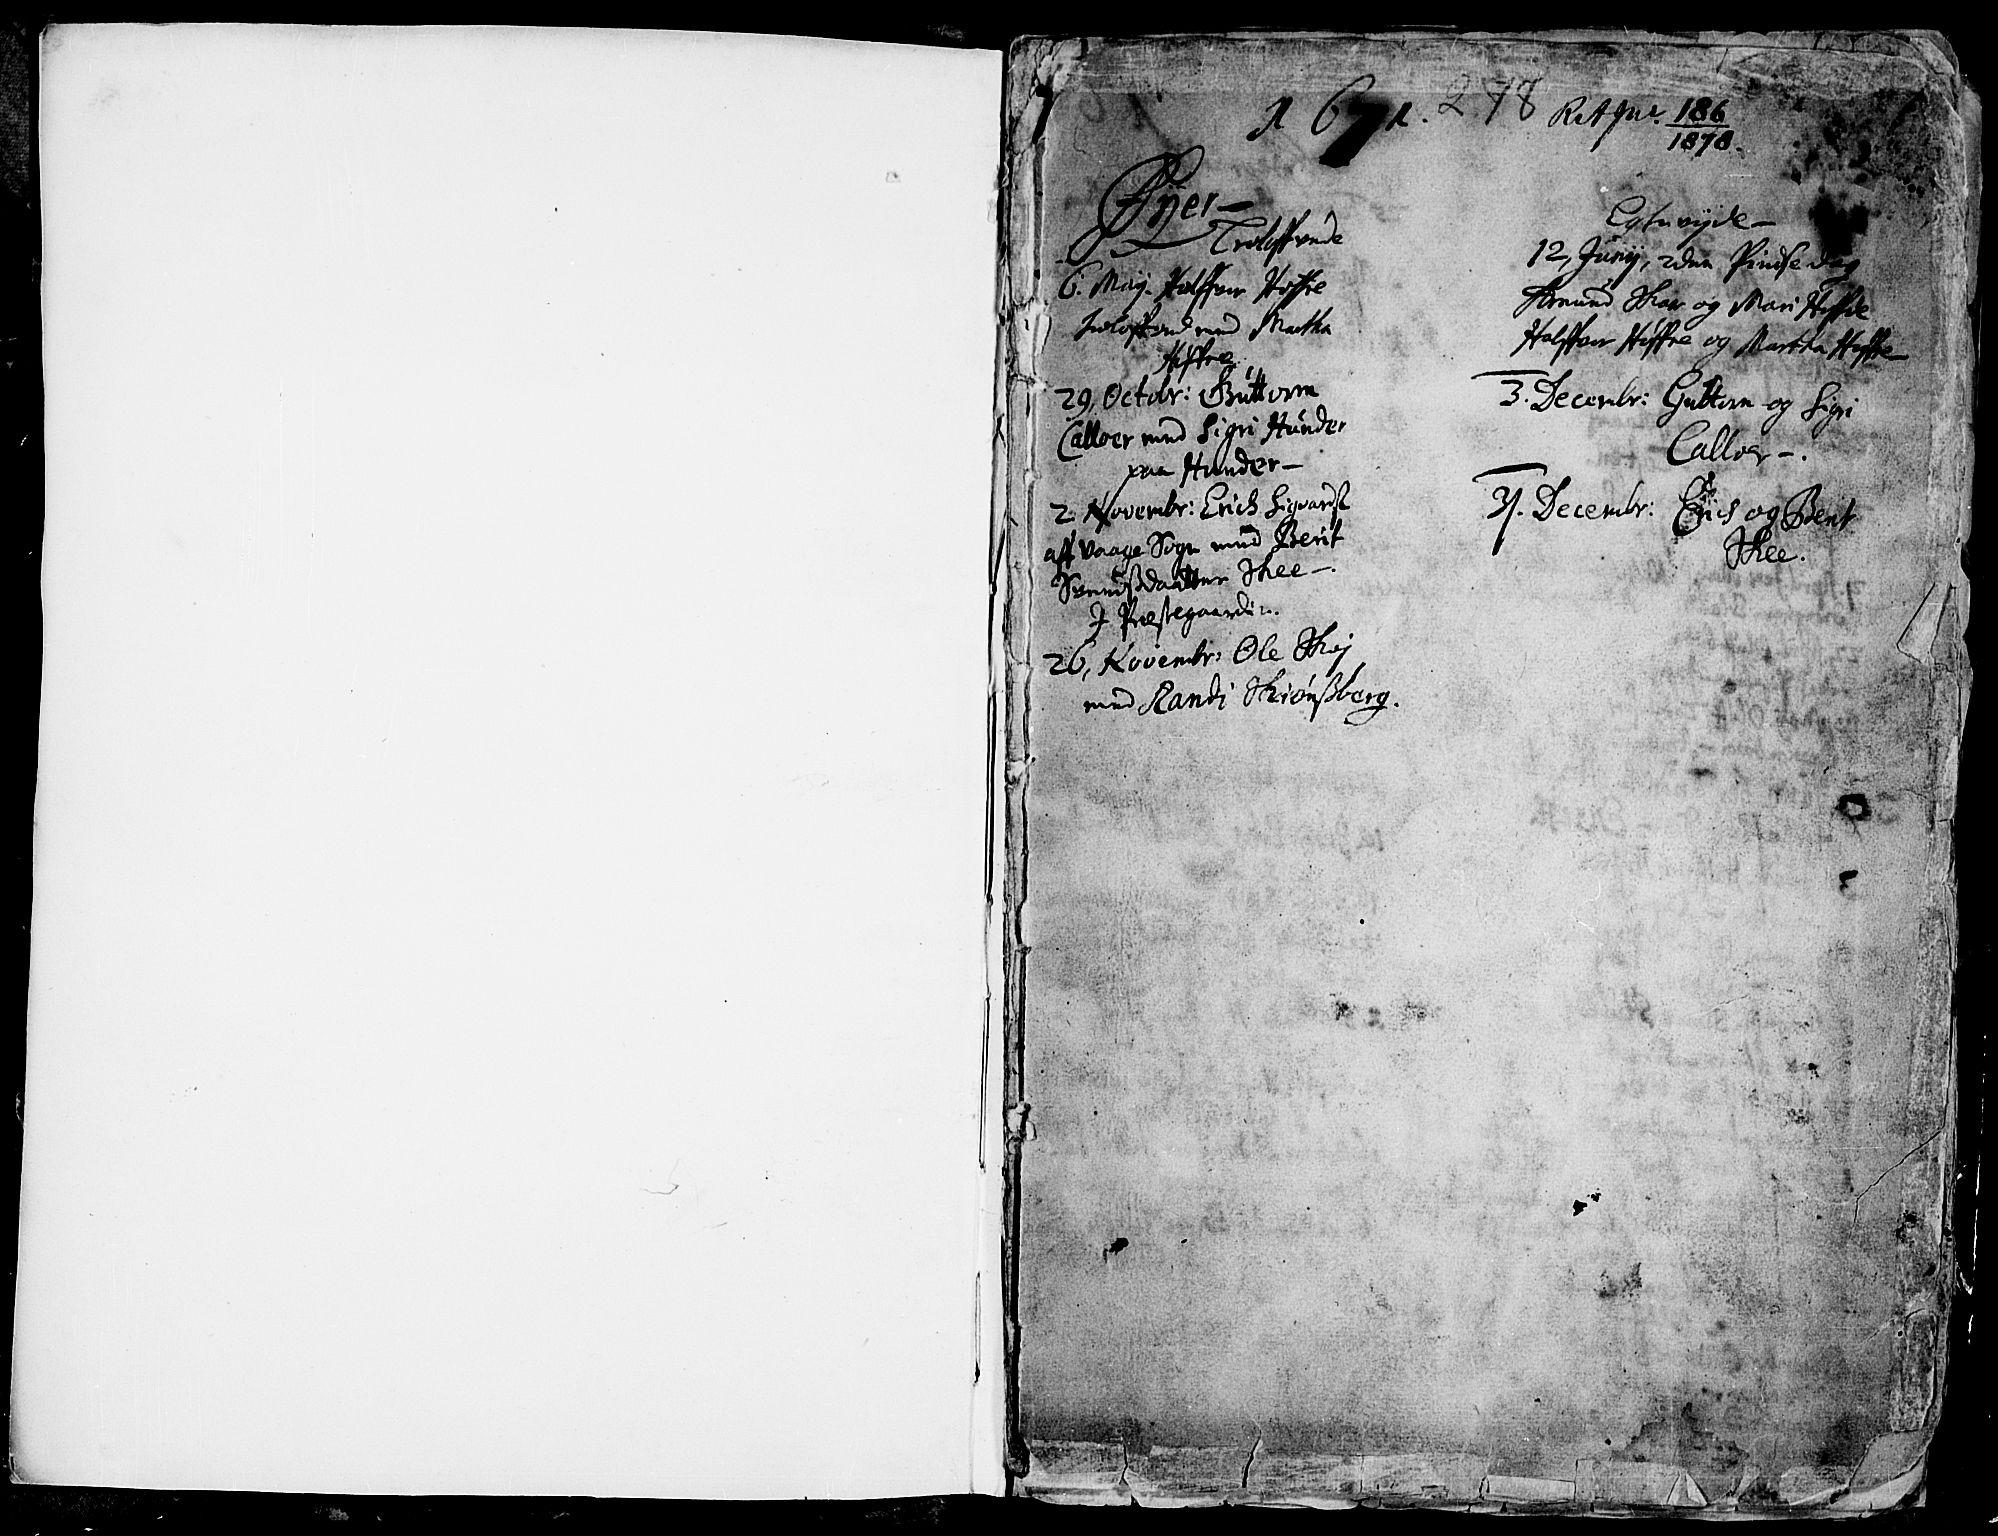 SAH, Øyer prestekontor, Ministerialbok nr. 1, 1671-1727, s. 0-1